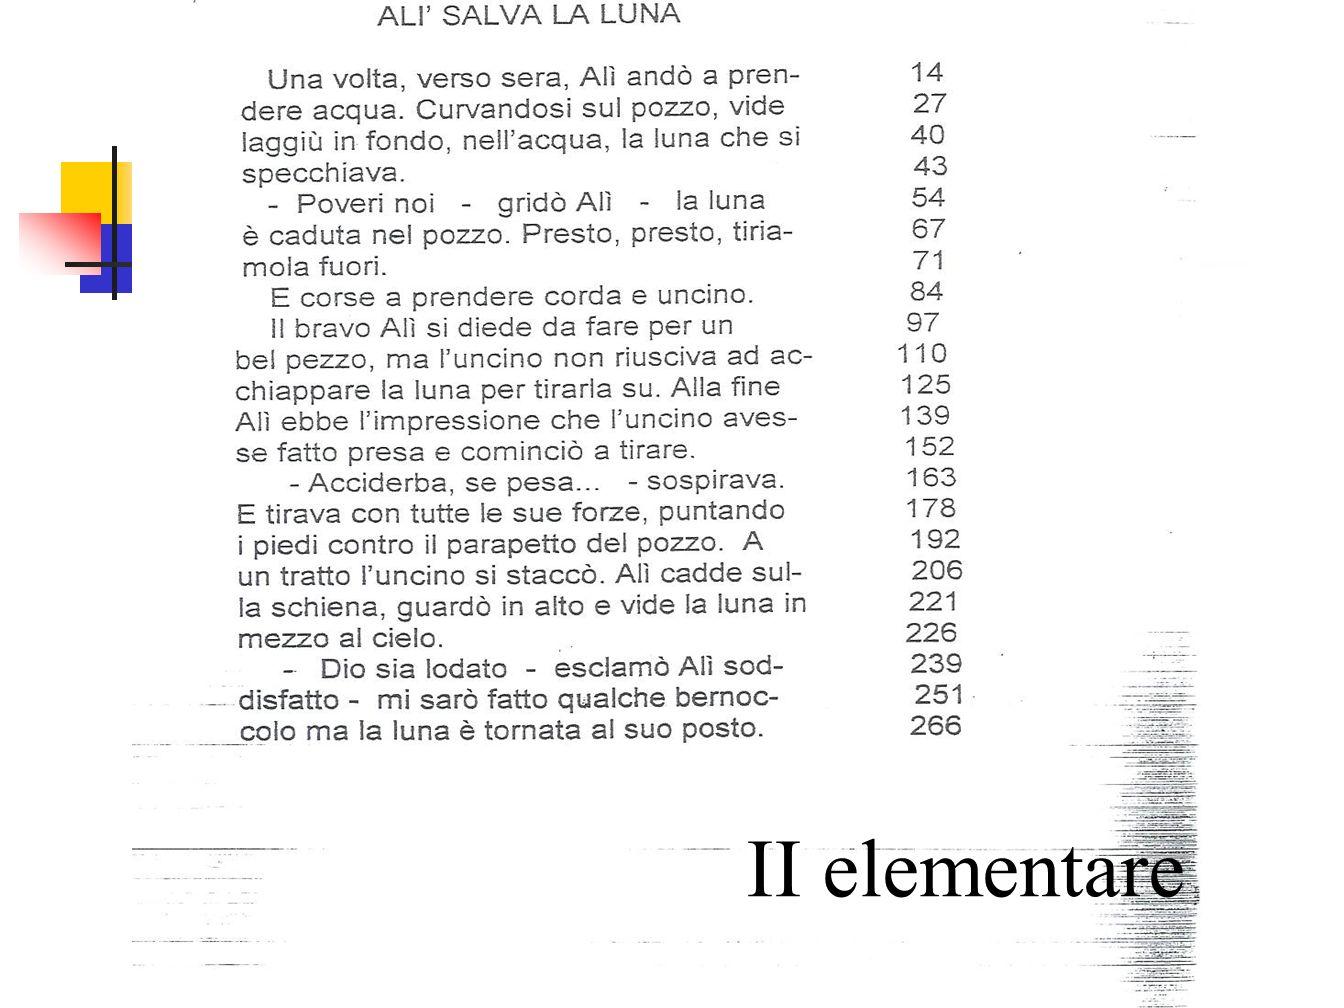 - screening II elementare- AID II elementare